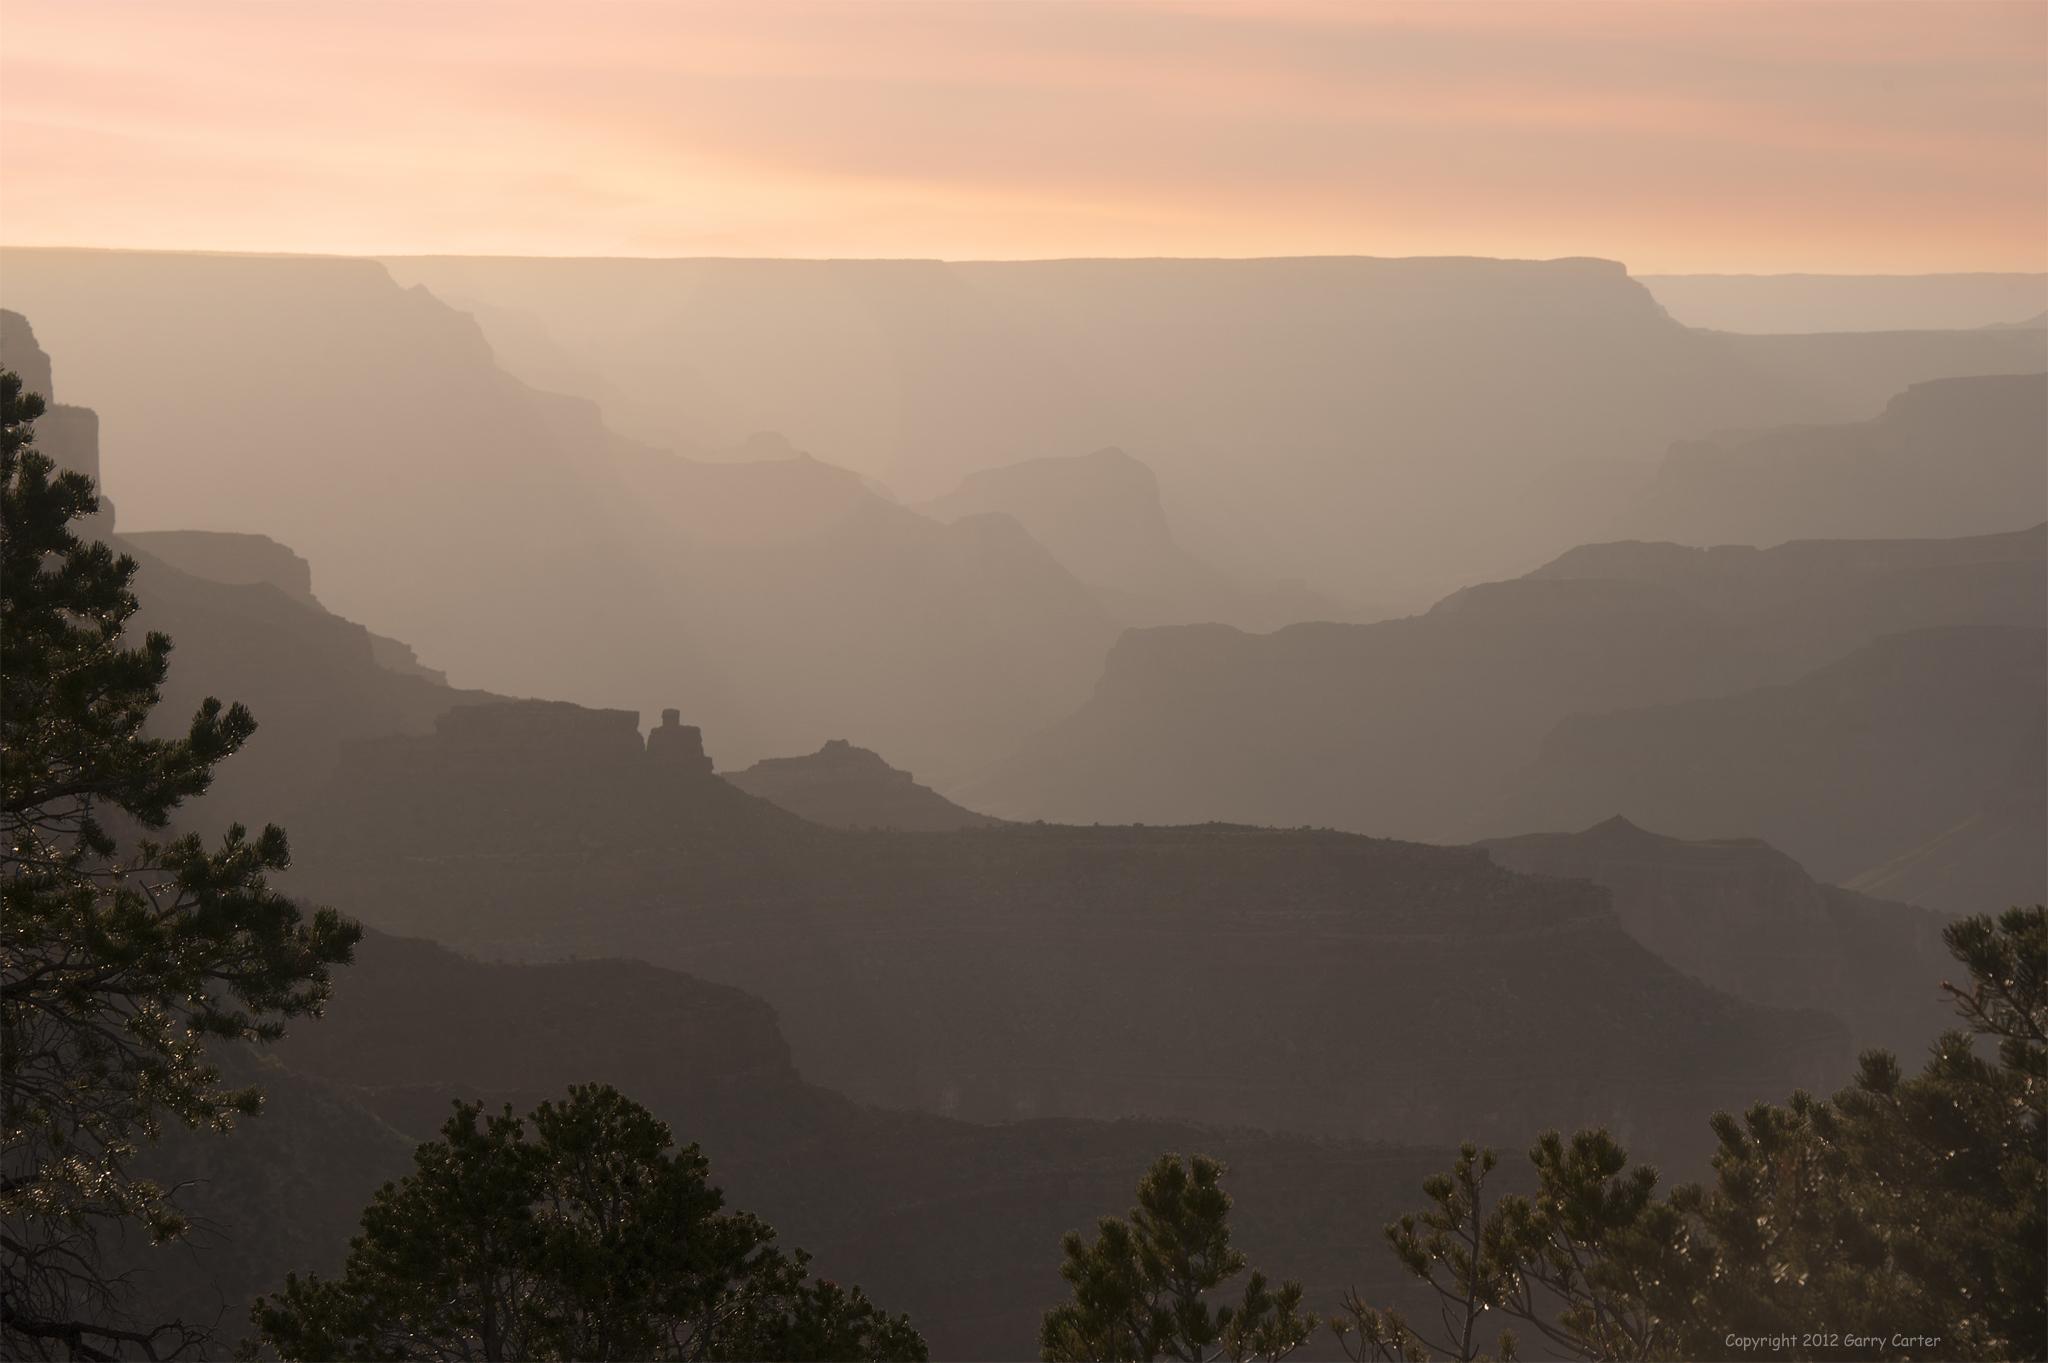 _GC74064_Grand Canyon Sunset.jpg